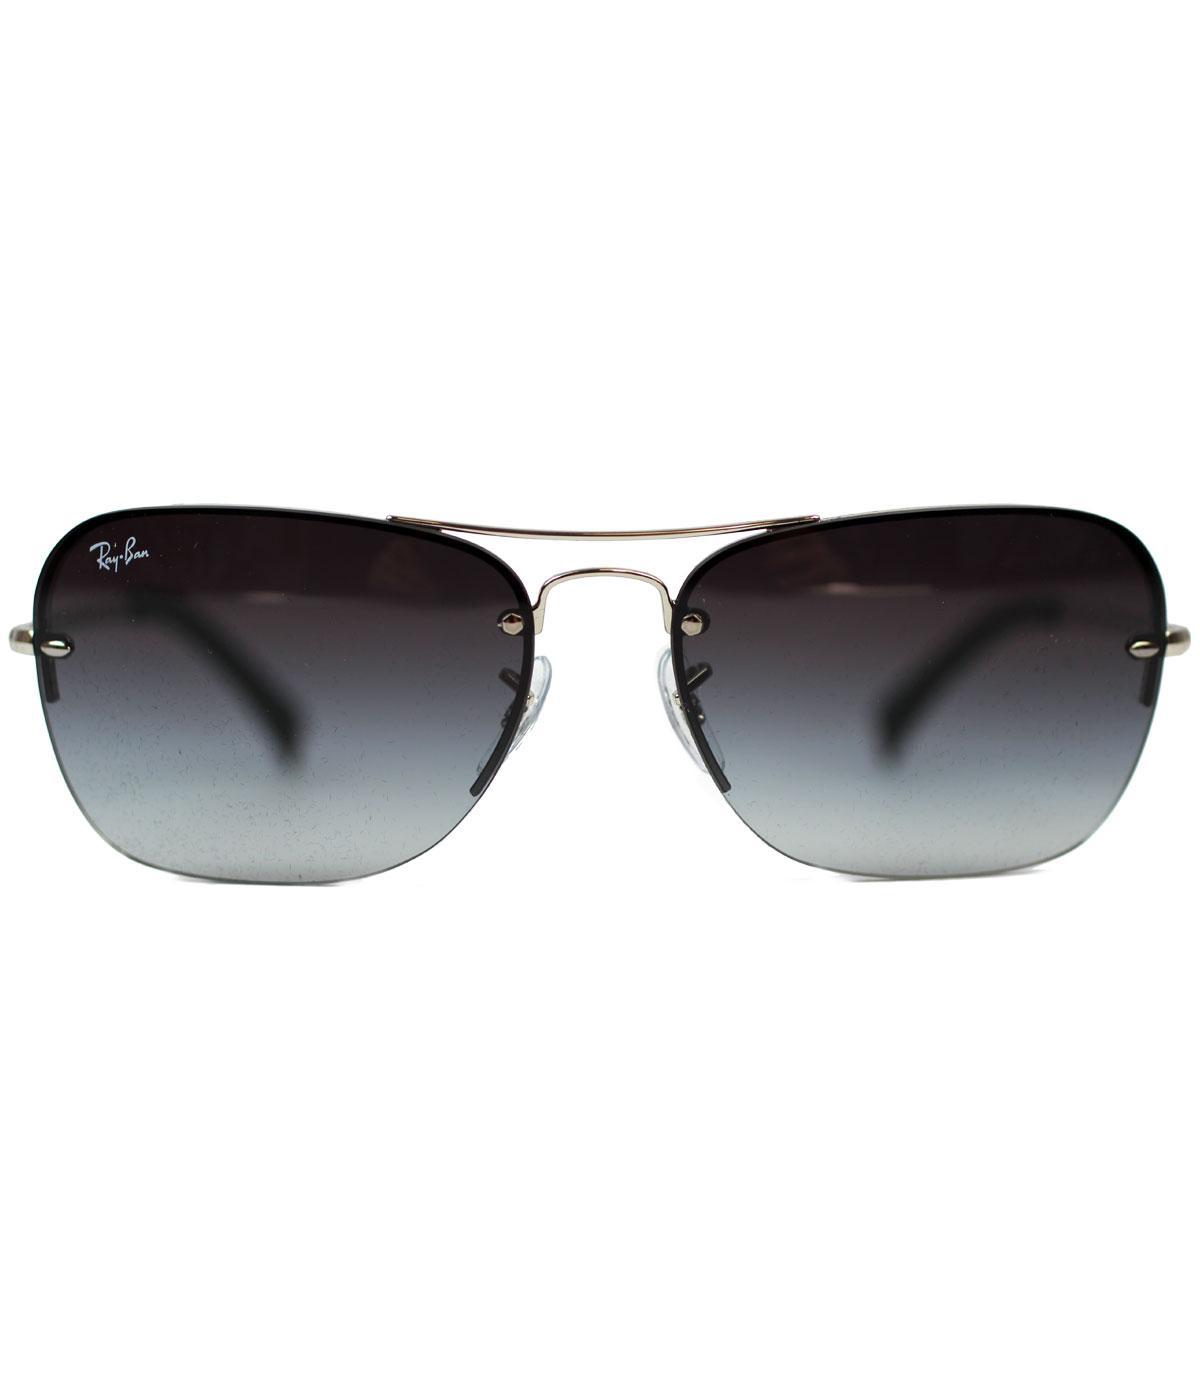 pilot ray ban  RAY-BAN Retro 70s Pilot Aviator Sunglasses in Silver/Grey